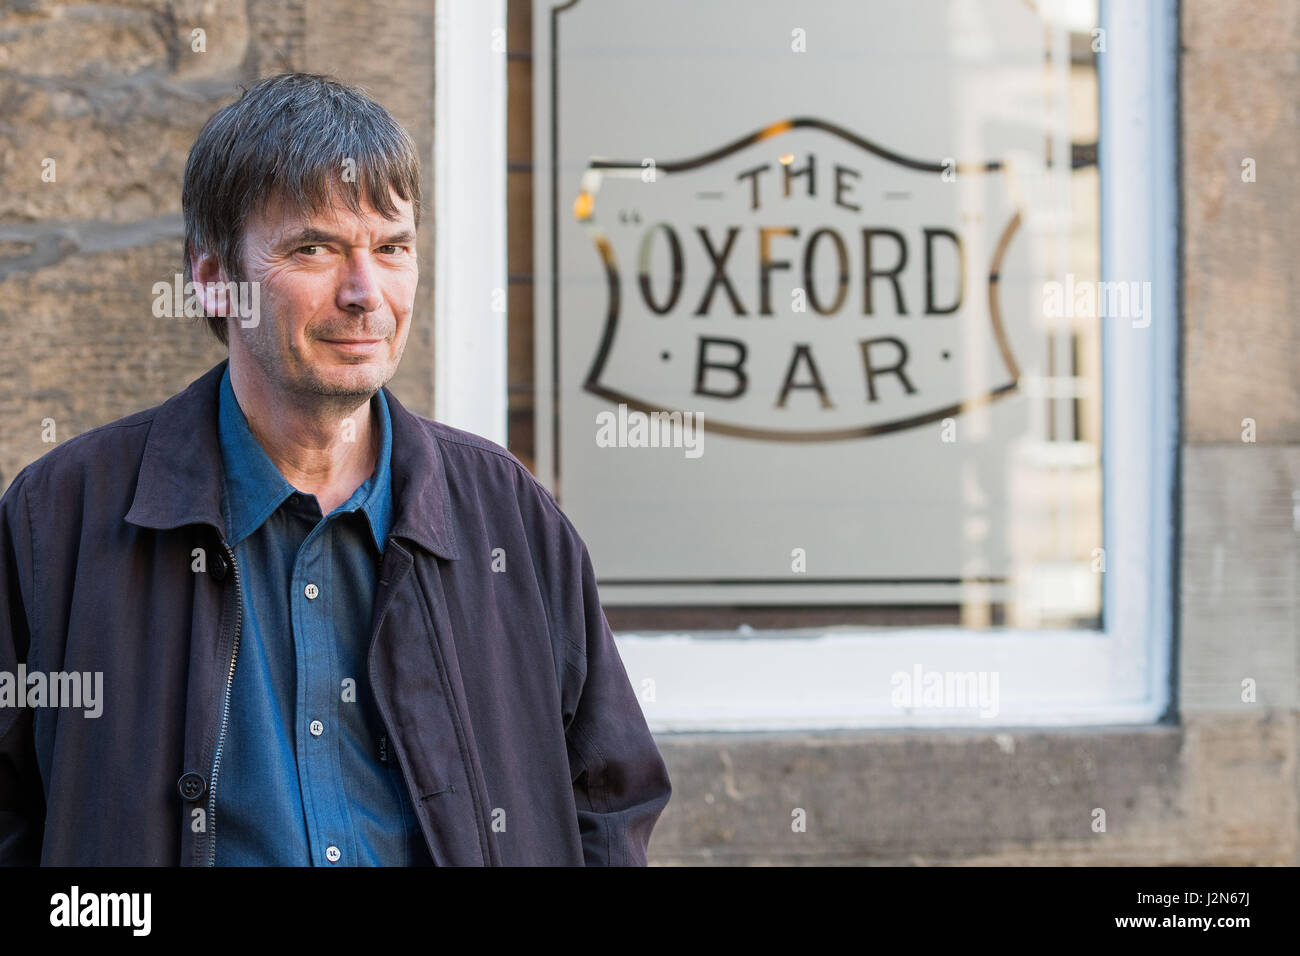 Photographer Ian Georgeson, 07921 567360 Author Ian Rankin, Oxford Bar, Rather be The Devil Stock Photo